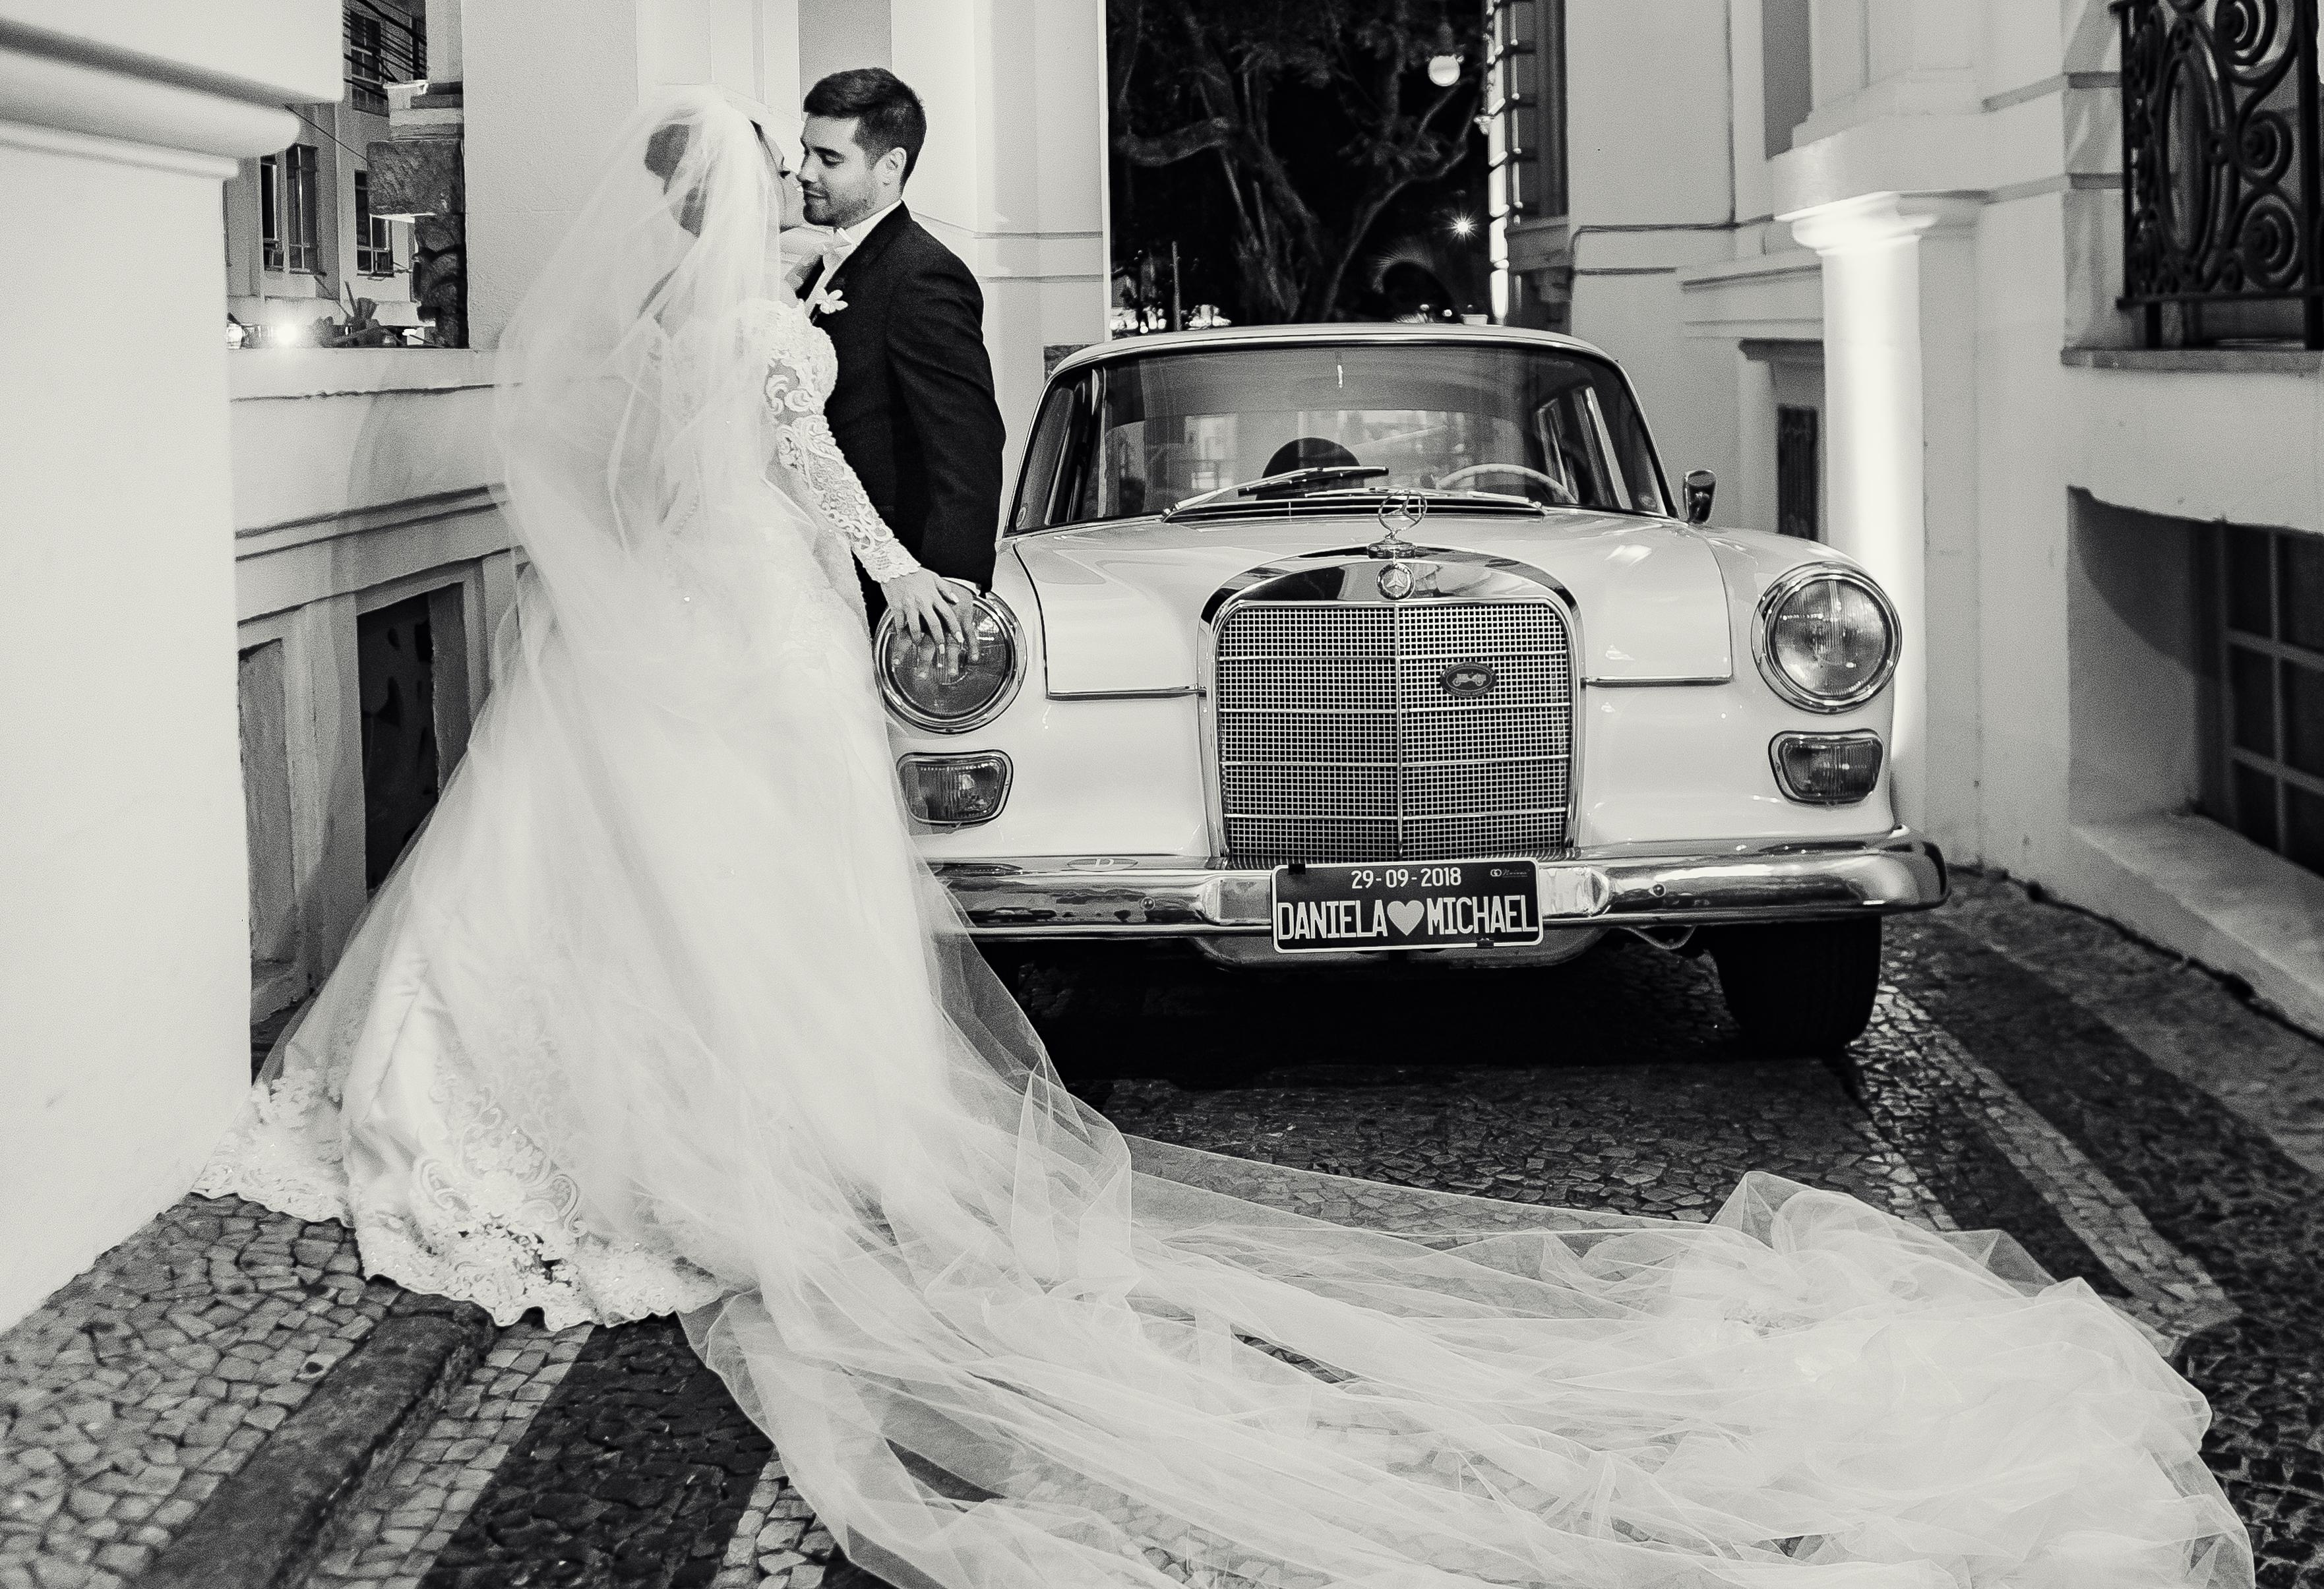 Casamento clássico: ensaio dos noivos Foto: V Rebel Cinema One